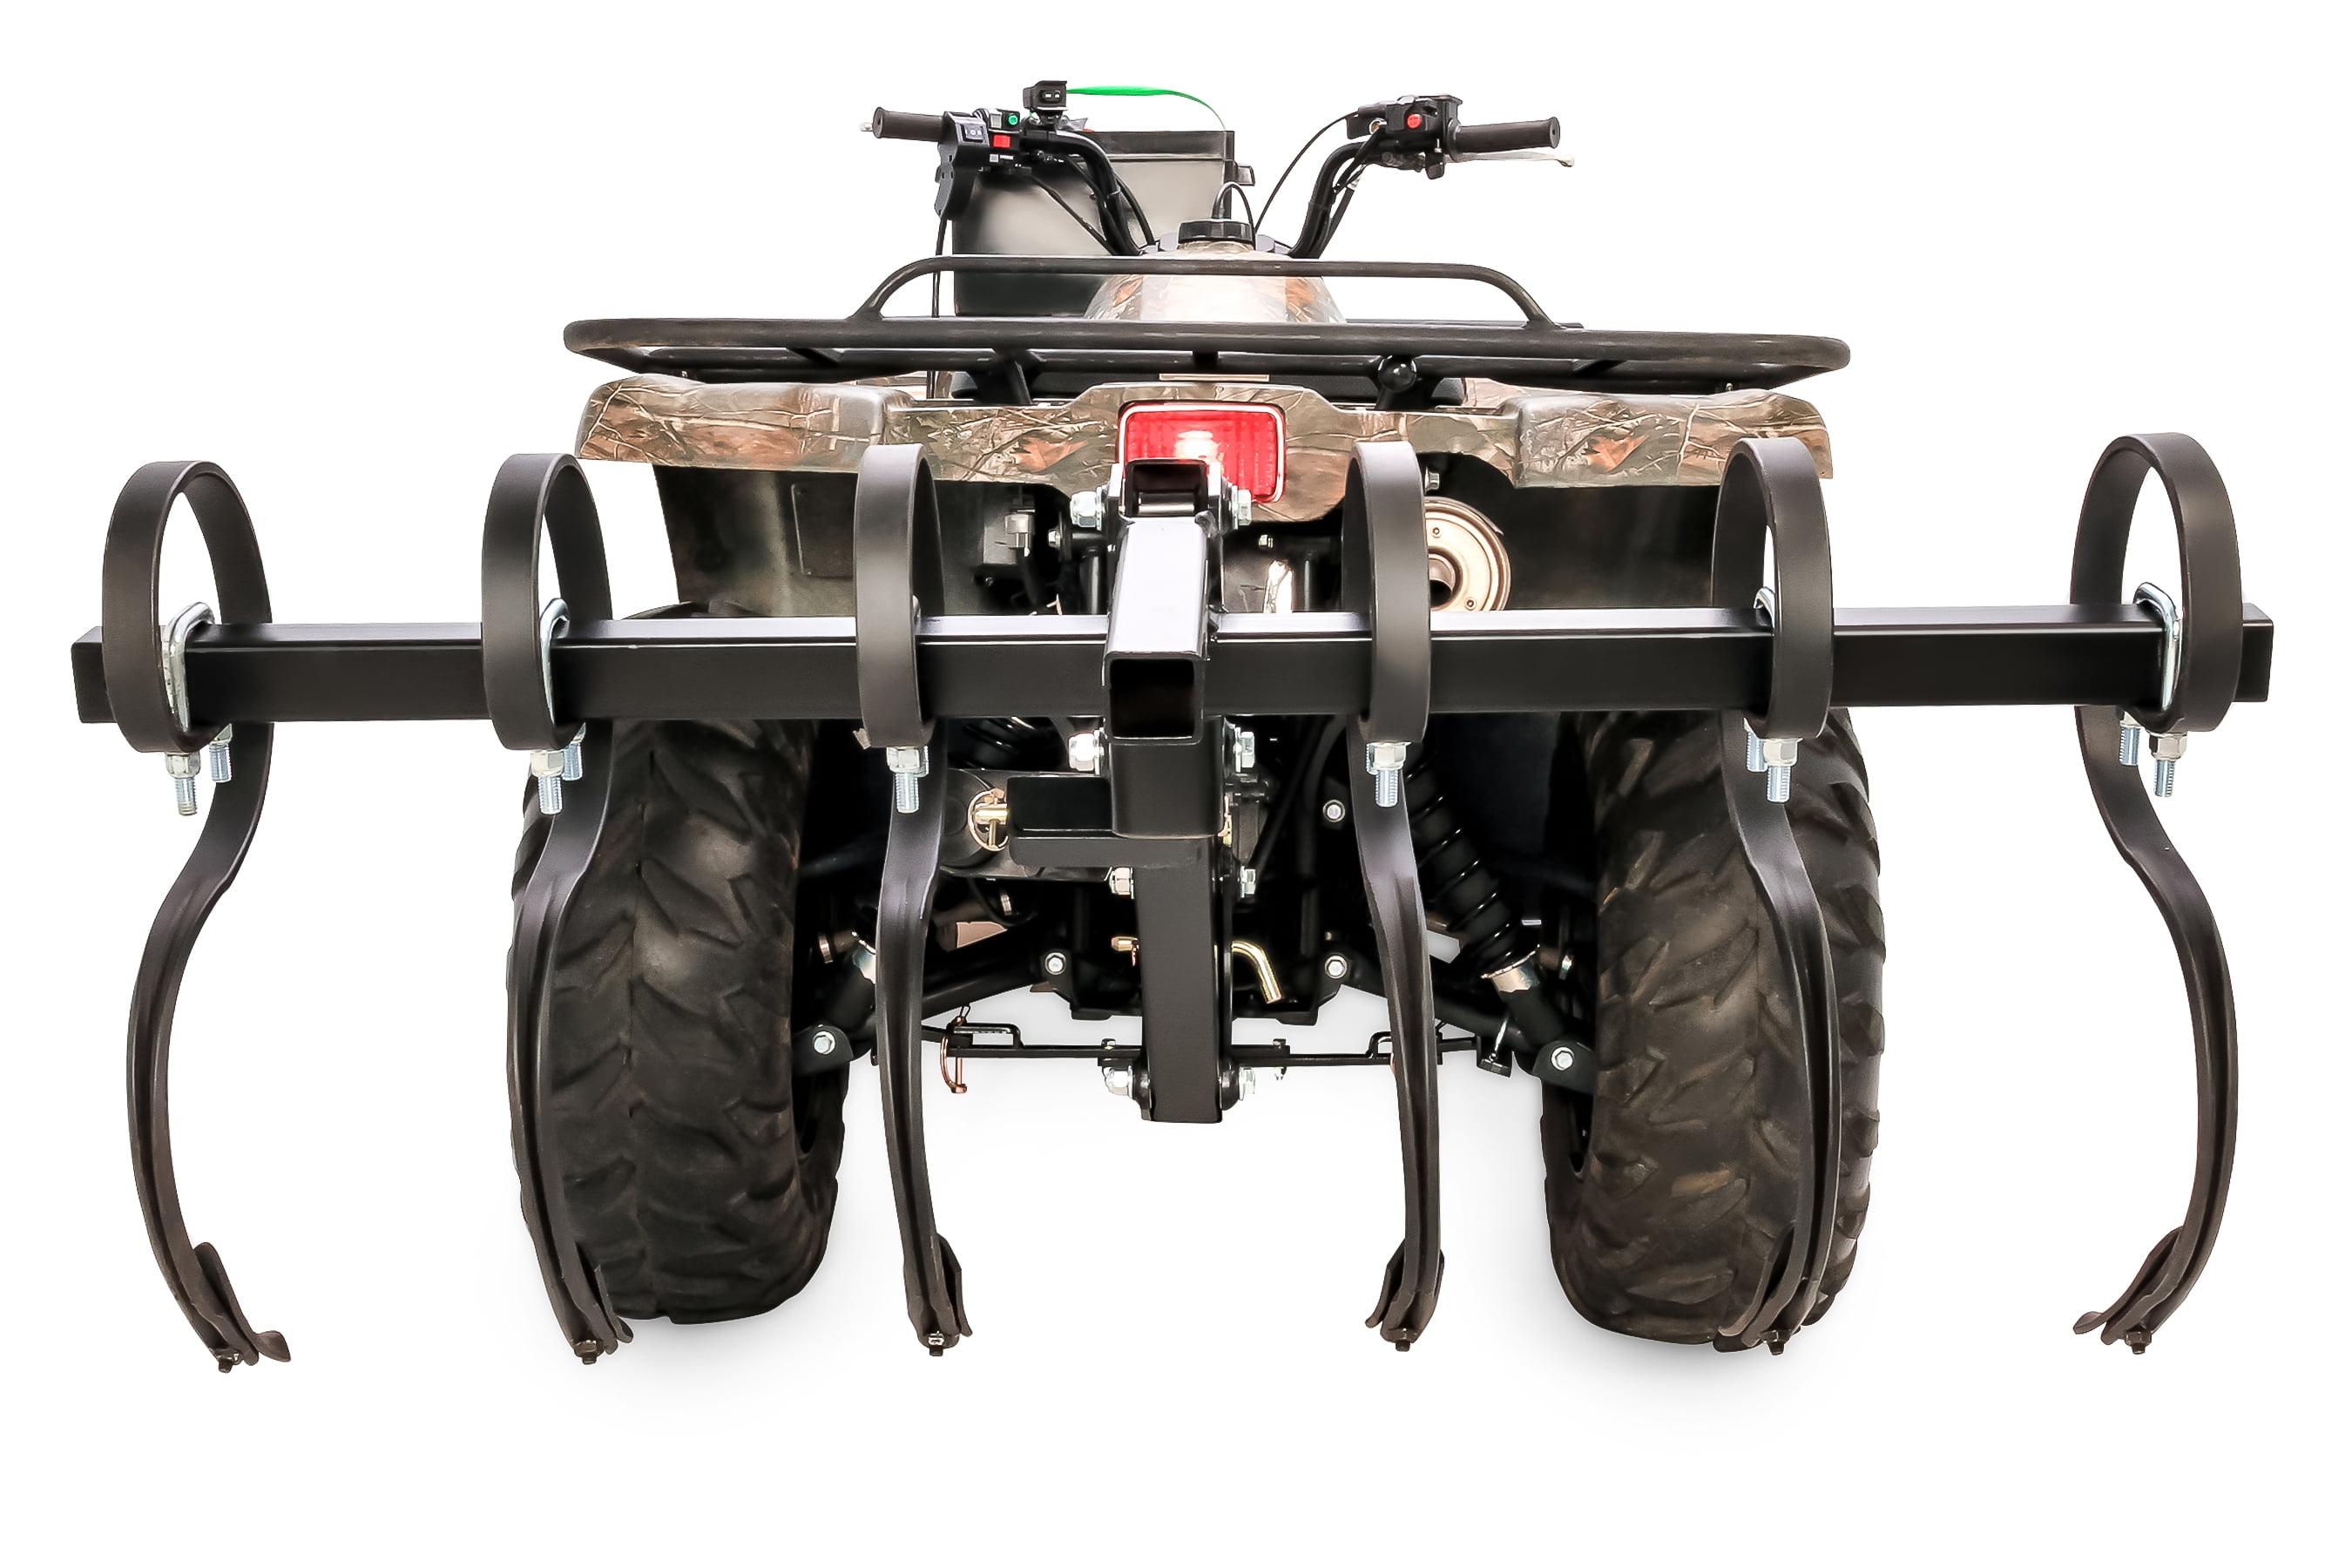 66007 for New Ground Preparation or Re-tilling Black Boar ATV//UTV S-Tine Cultivator Camco